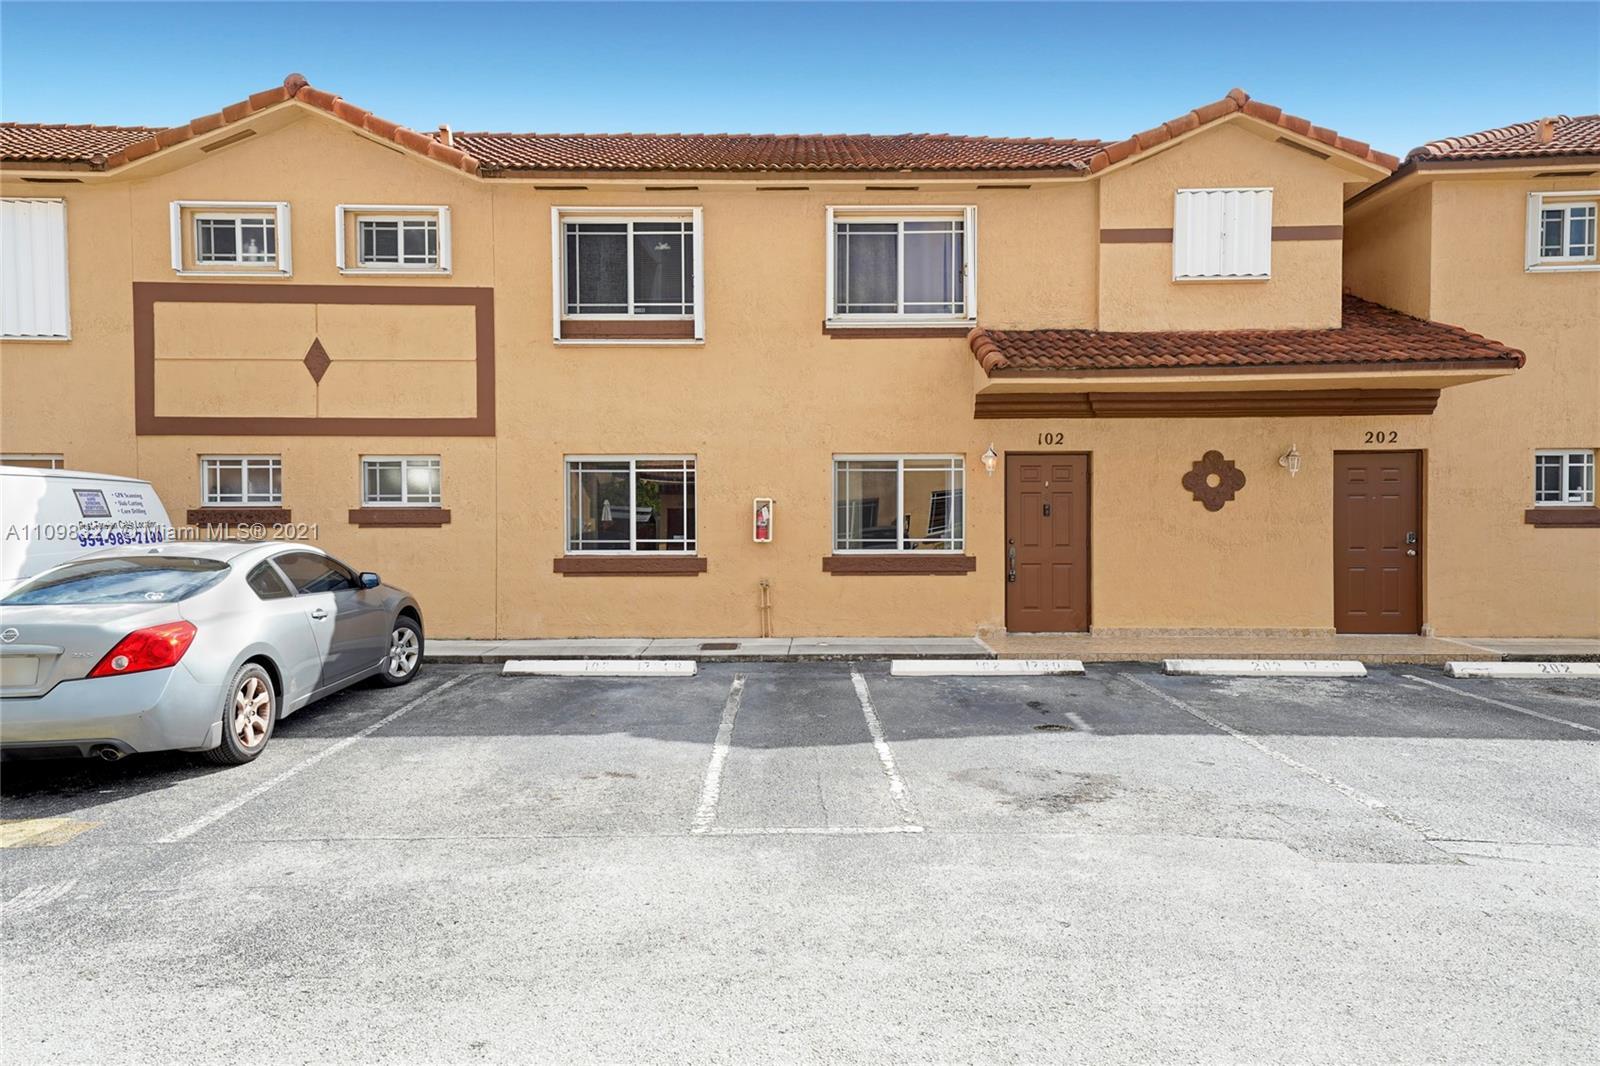 17308 74th Ave Unit 102, Hialeah, Florida 33015